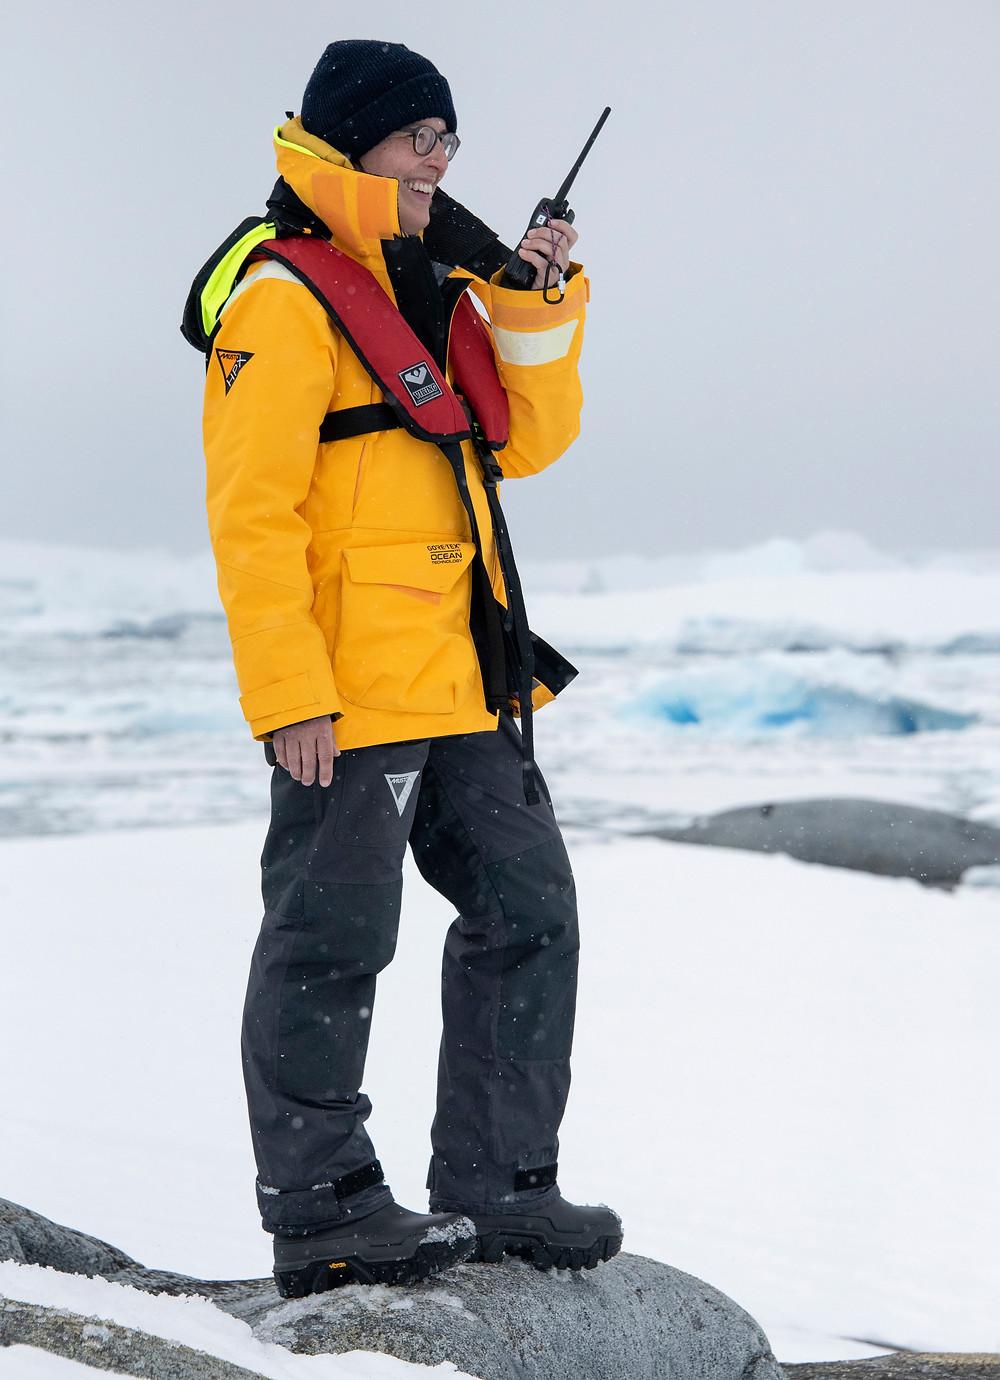 assistant expedition leader, sandra walser, expedition guide, expedition guide academy, expedition guide training, vhf radio, sea ice, ice berg, antarctica, arctic